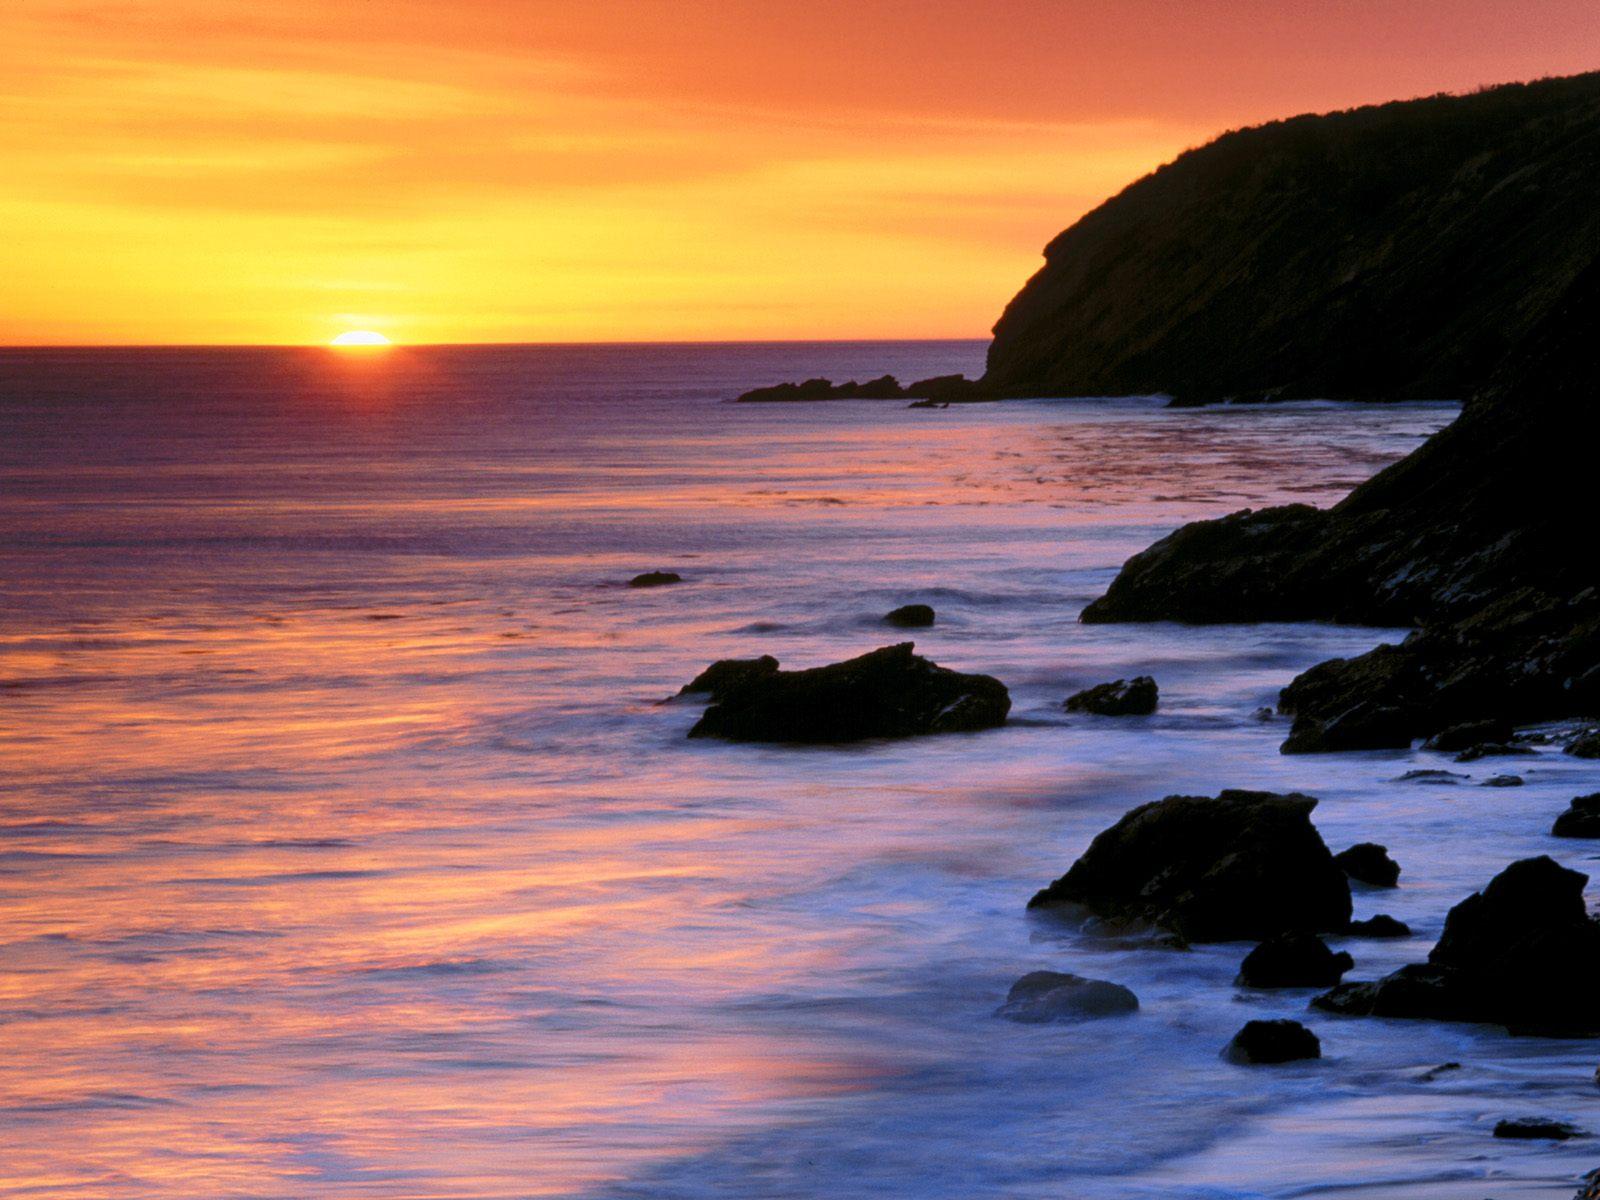 Sunset Desktop Backgrounds and Wallpaper   Pacific Sunset Gaviota 1600x1200